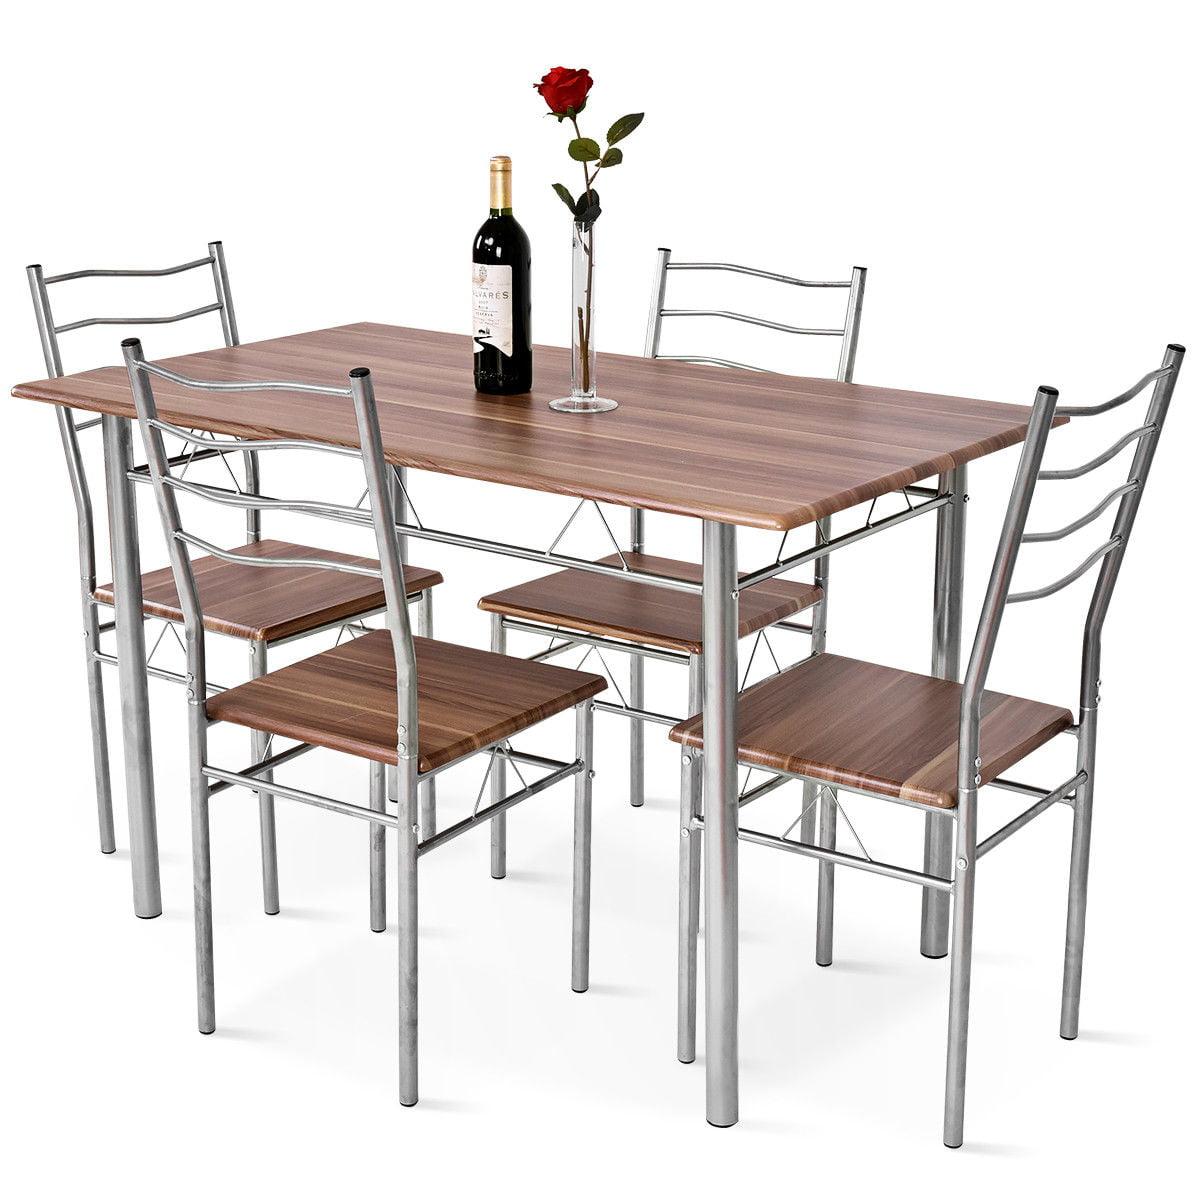 5 Piece Dining Table Set Wood Metal Kitchen Breakfast Furniture W4